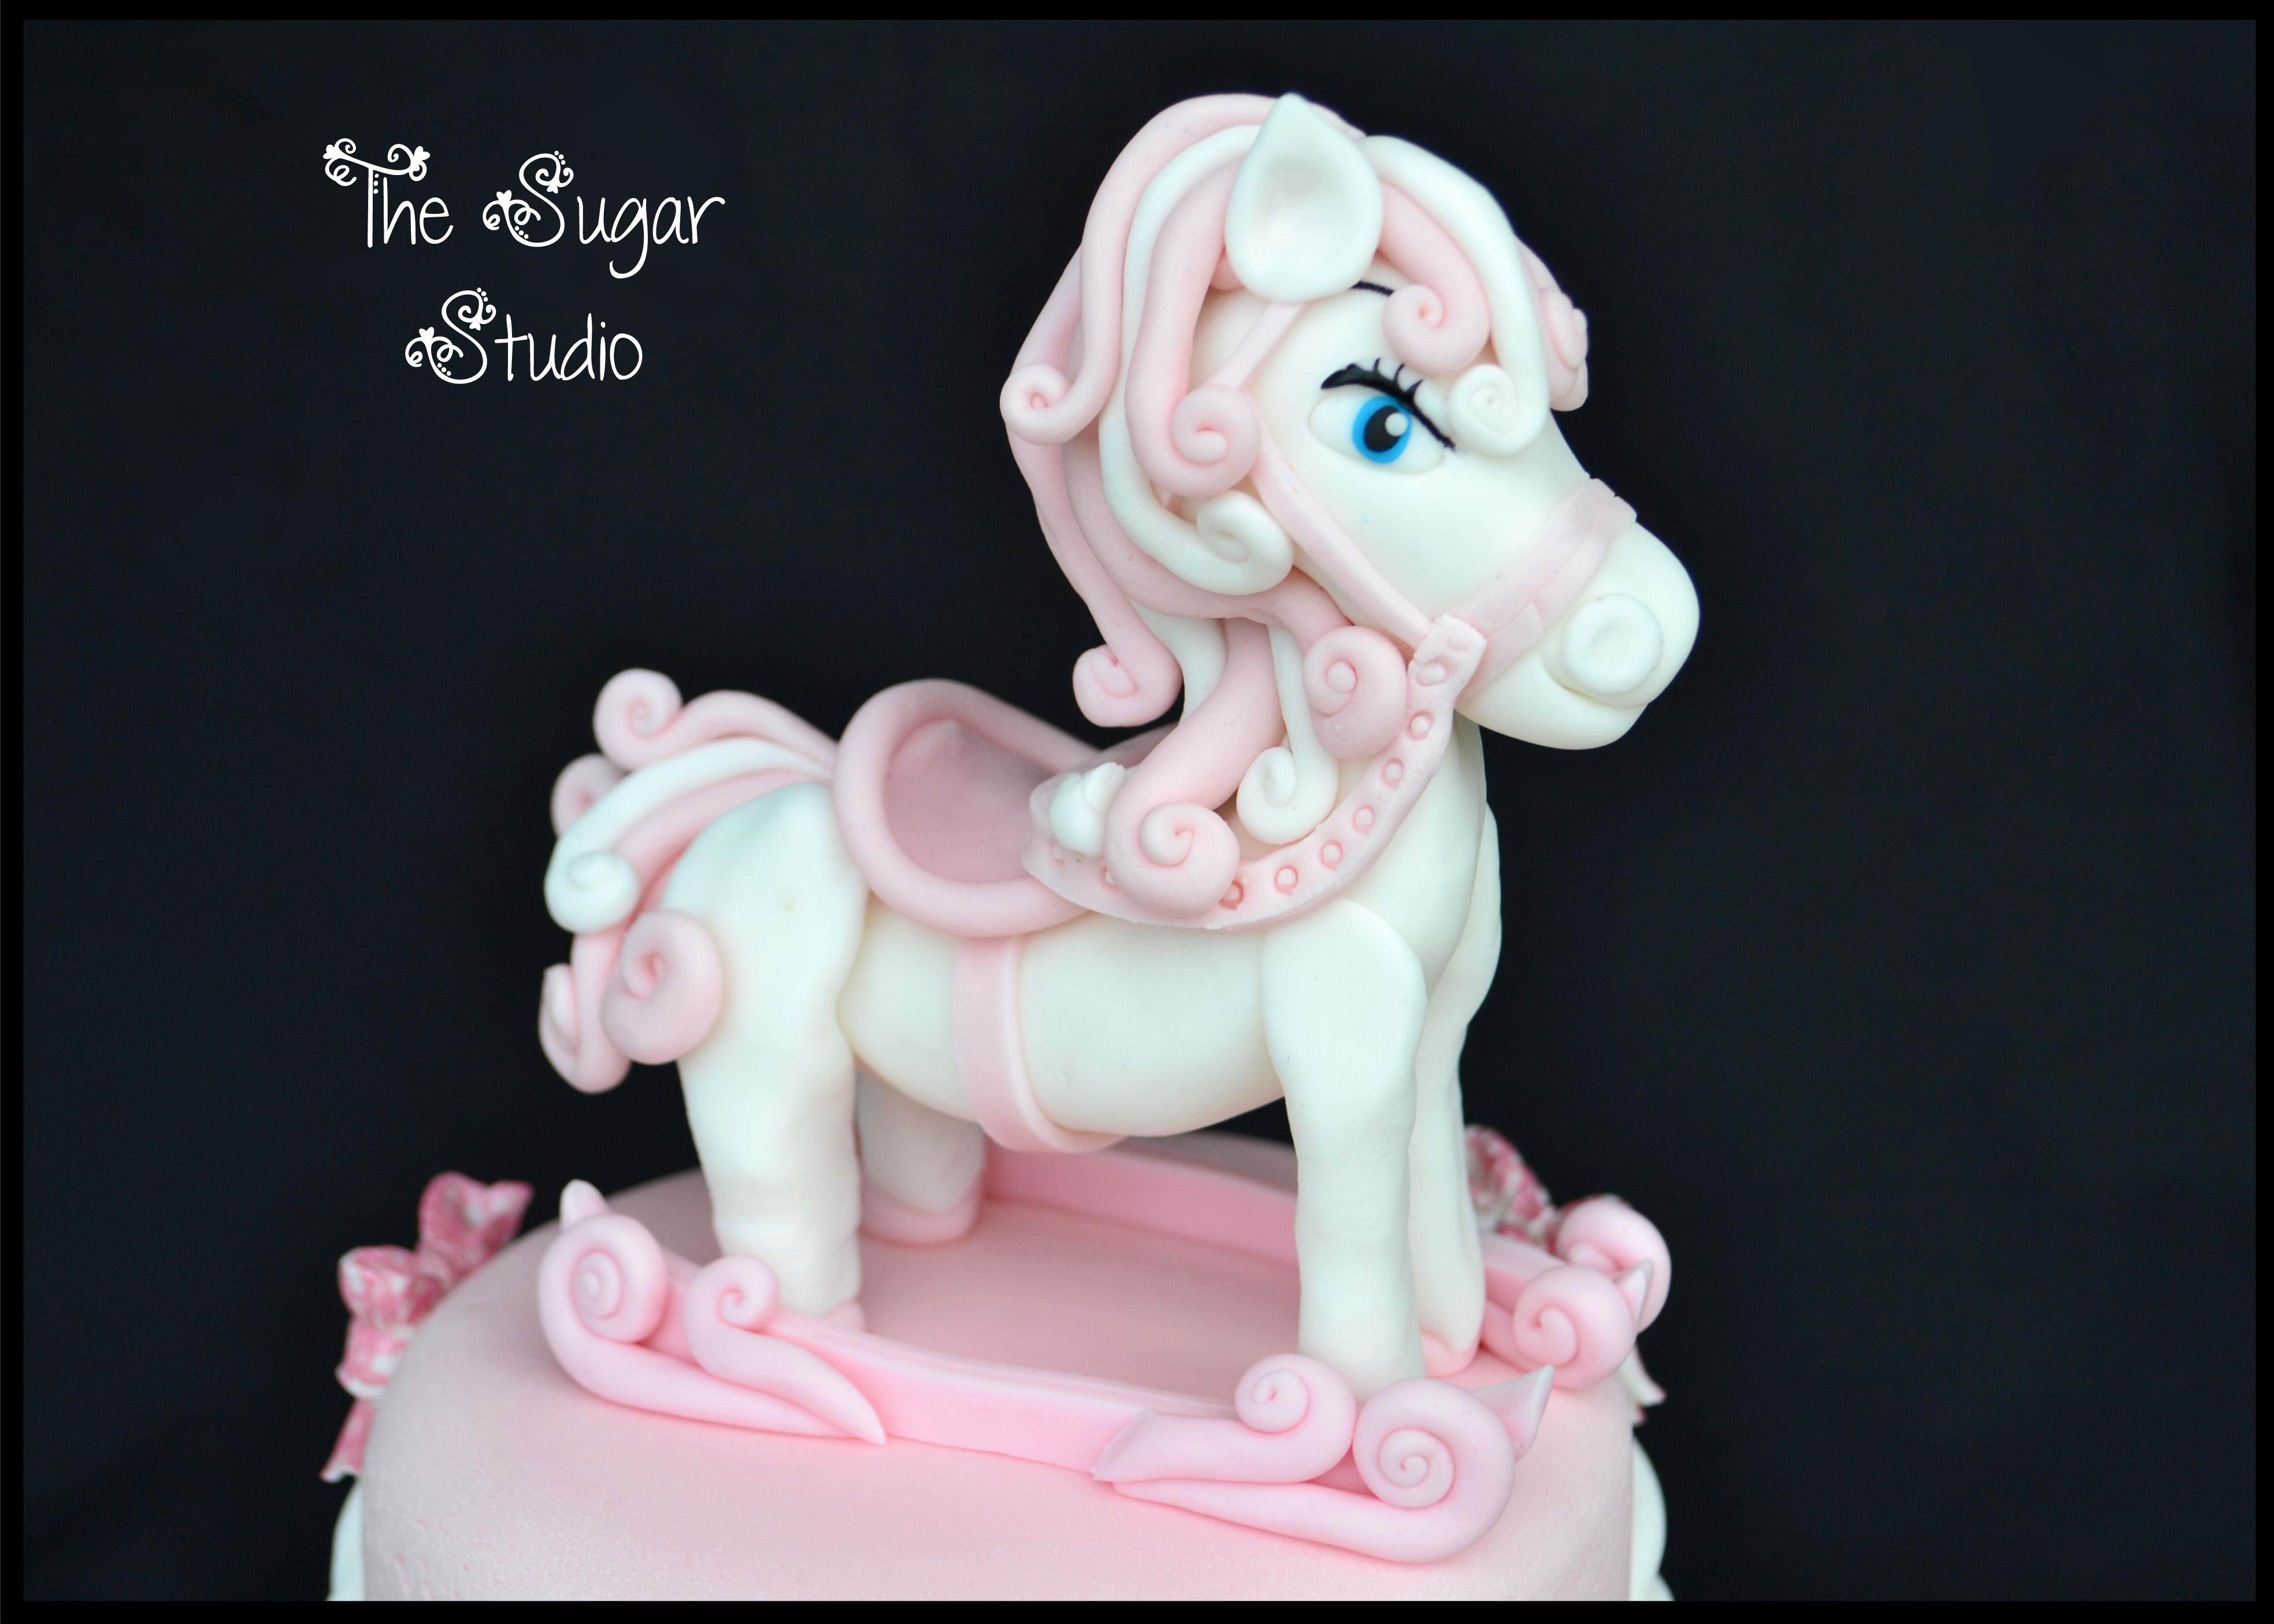 Cake Decorating Animal Figures Baby Girls Pink 2 Tier Christening Cake With Handmade Rocking